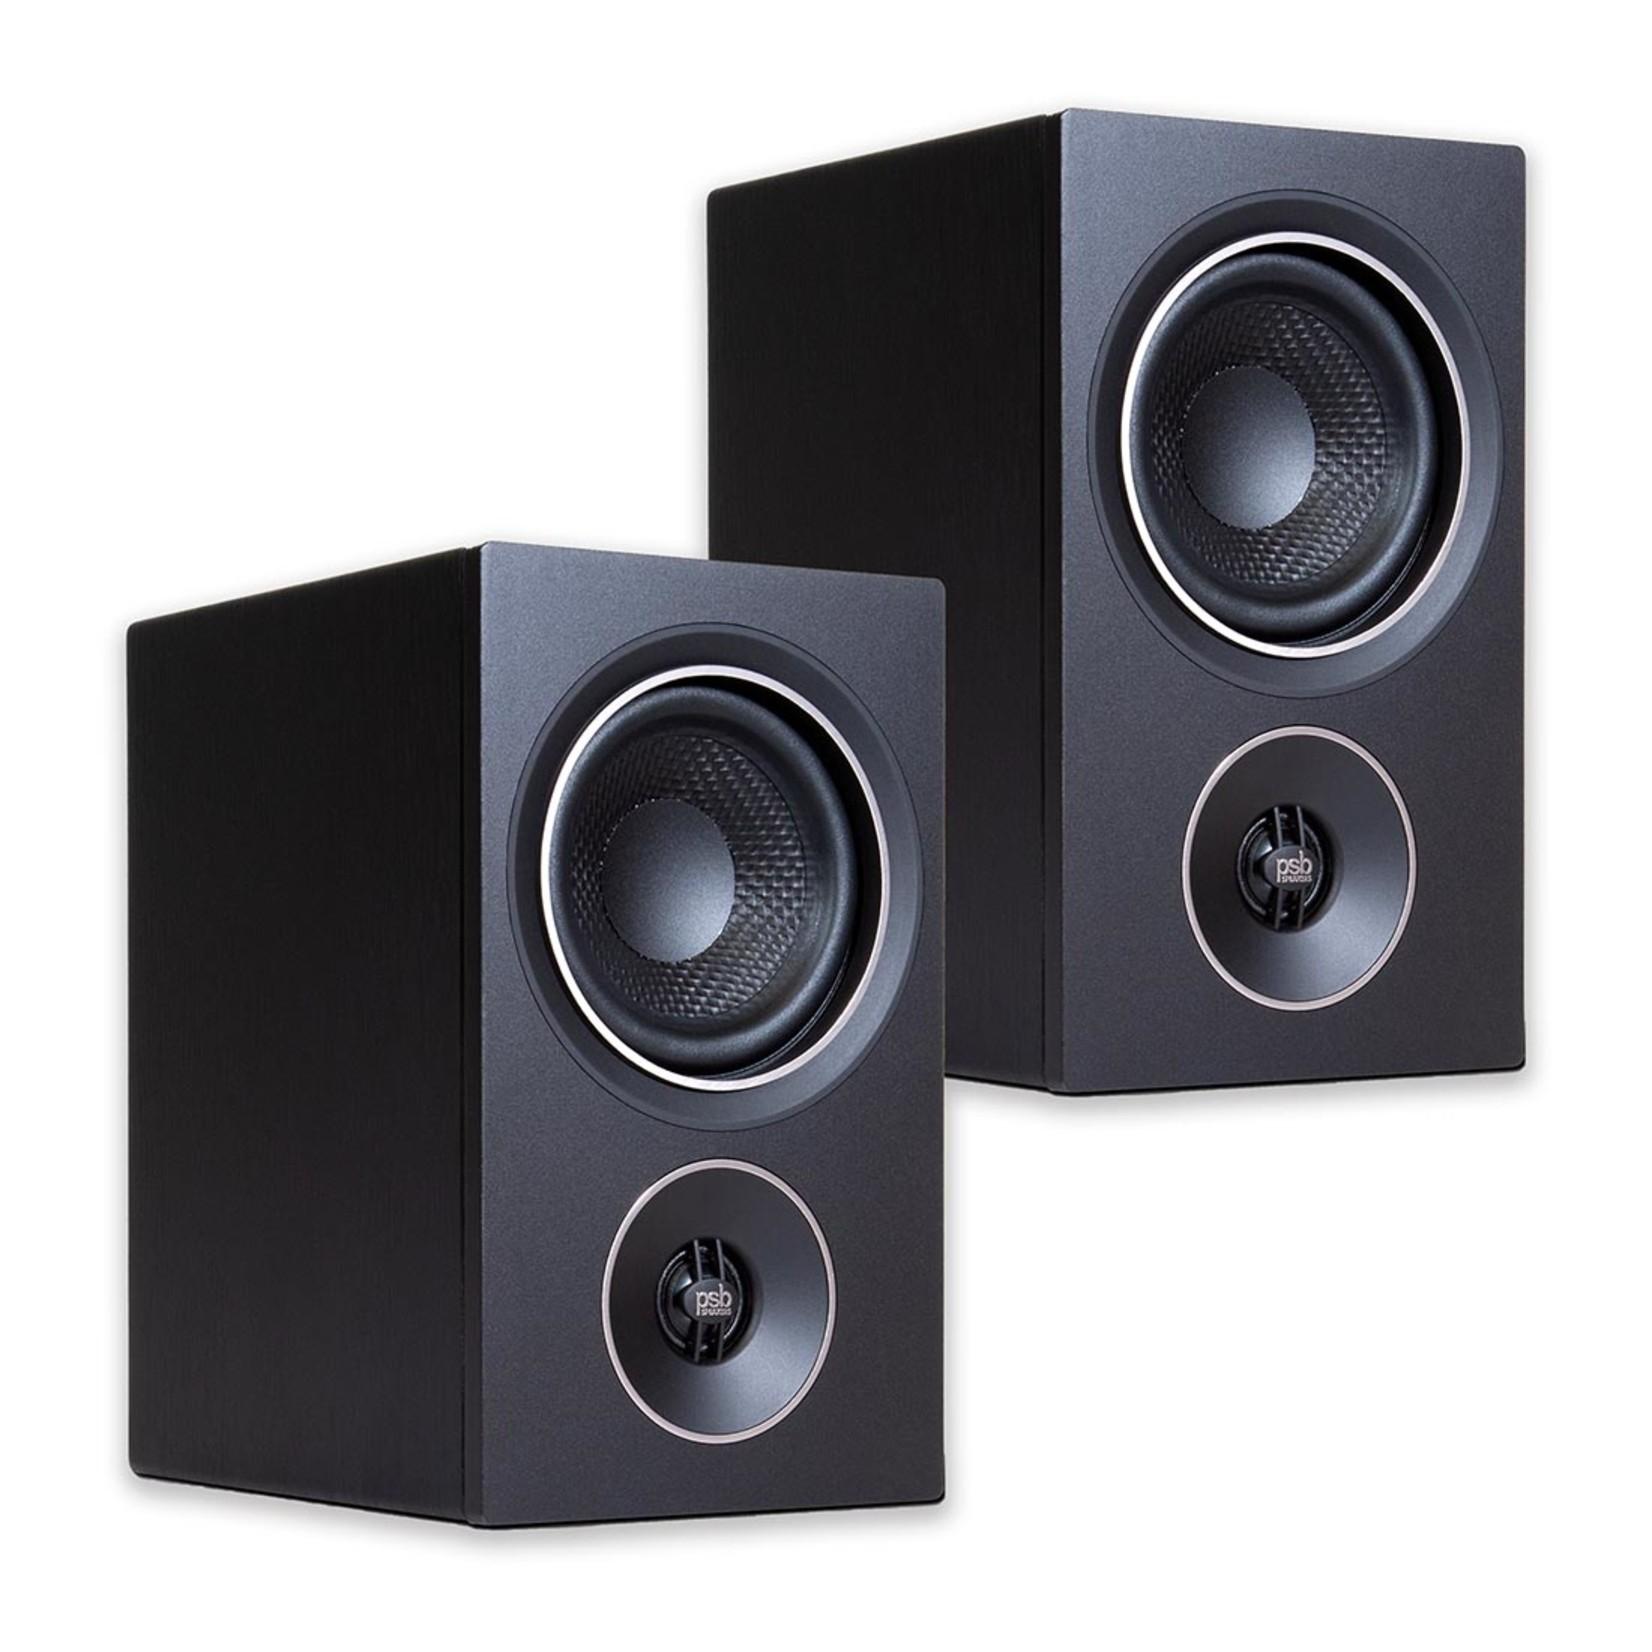 Accessory PSB - Alpha P5 Black Ash Speakers